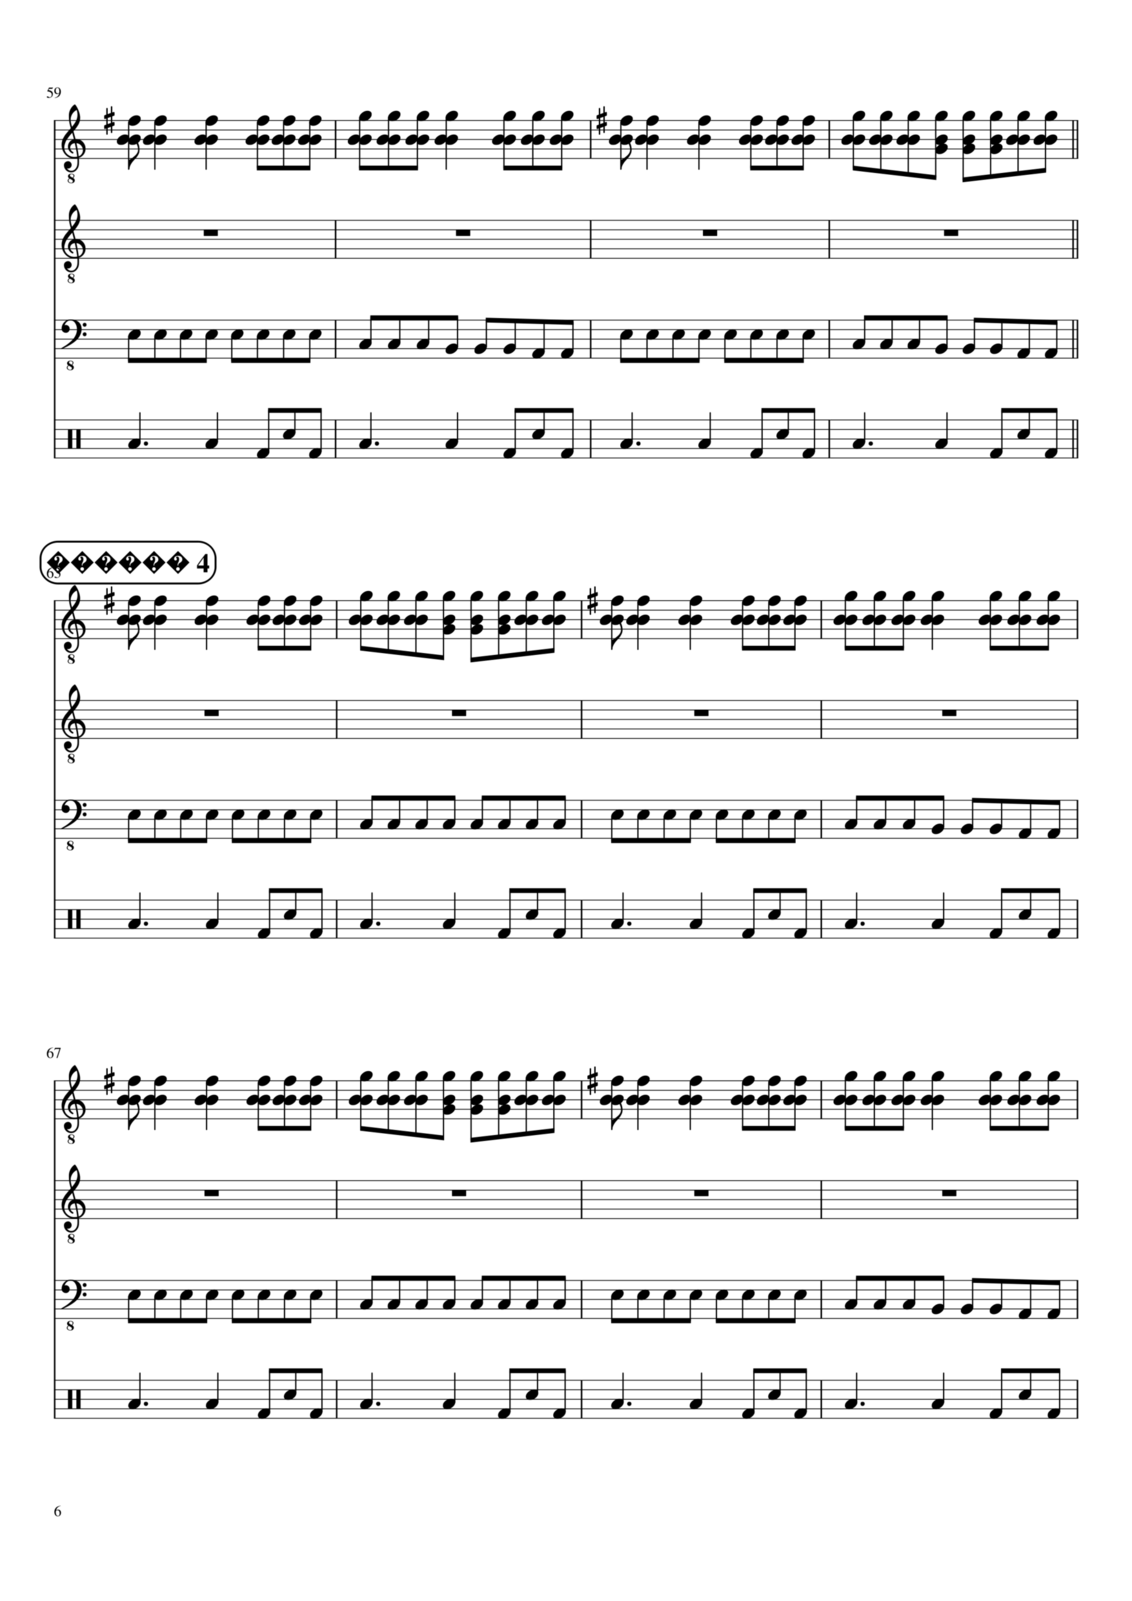 Deklassirovannyim elementam slide, Image 6